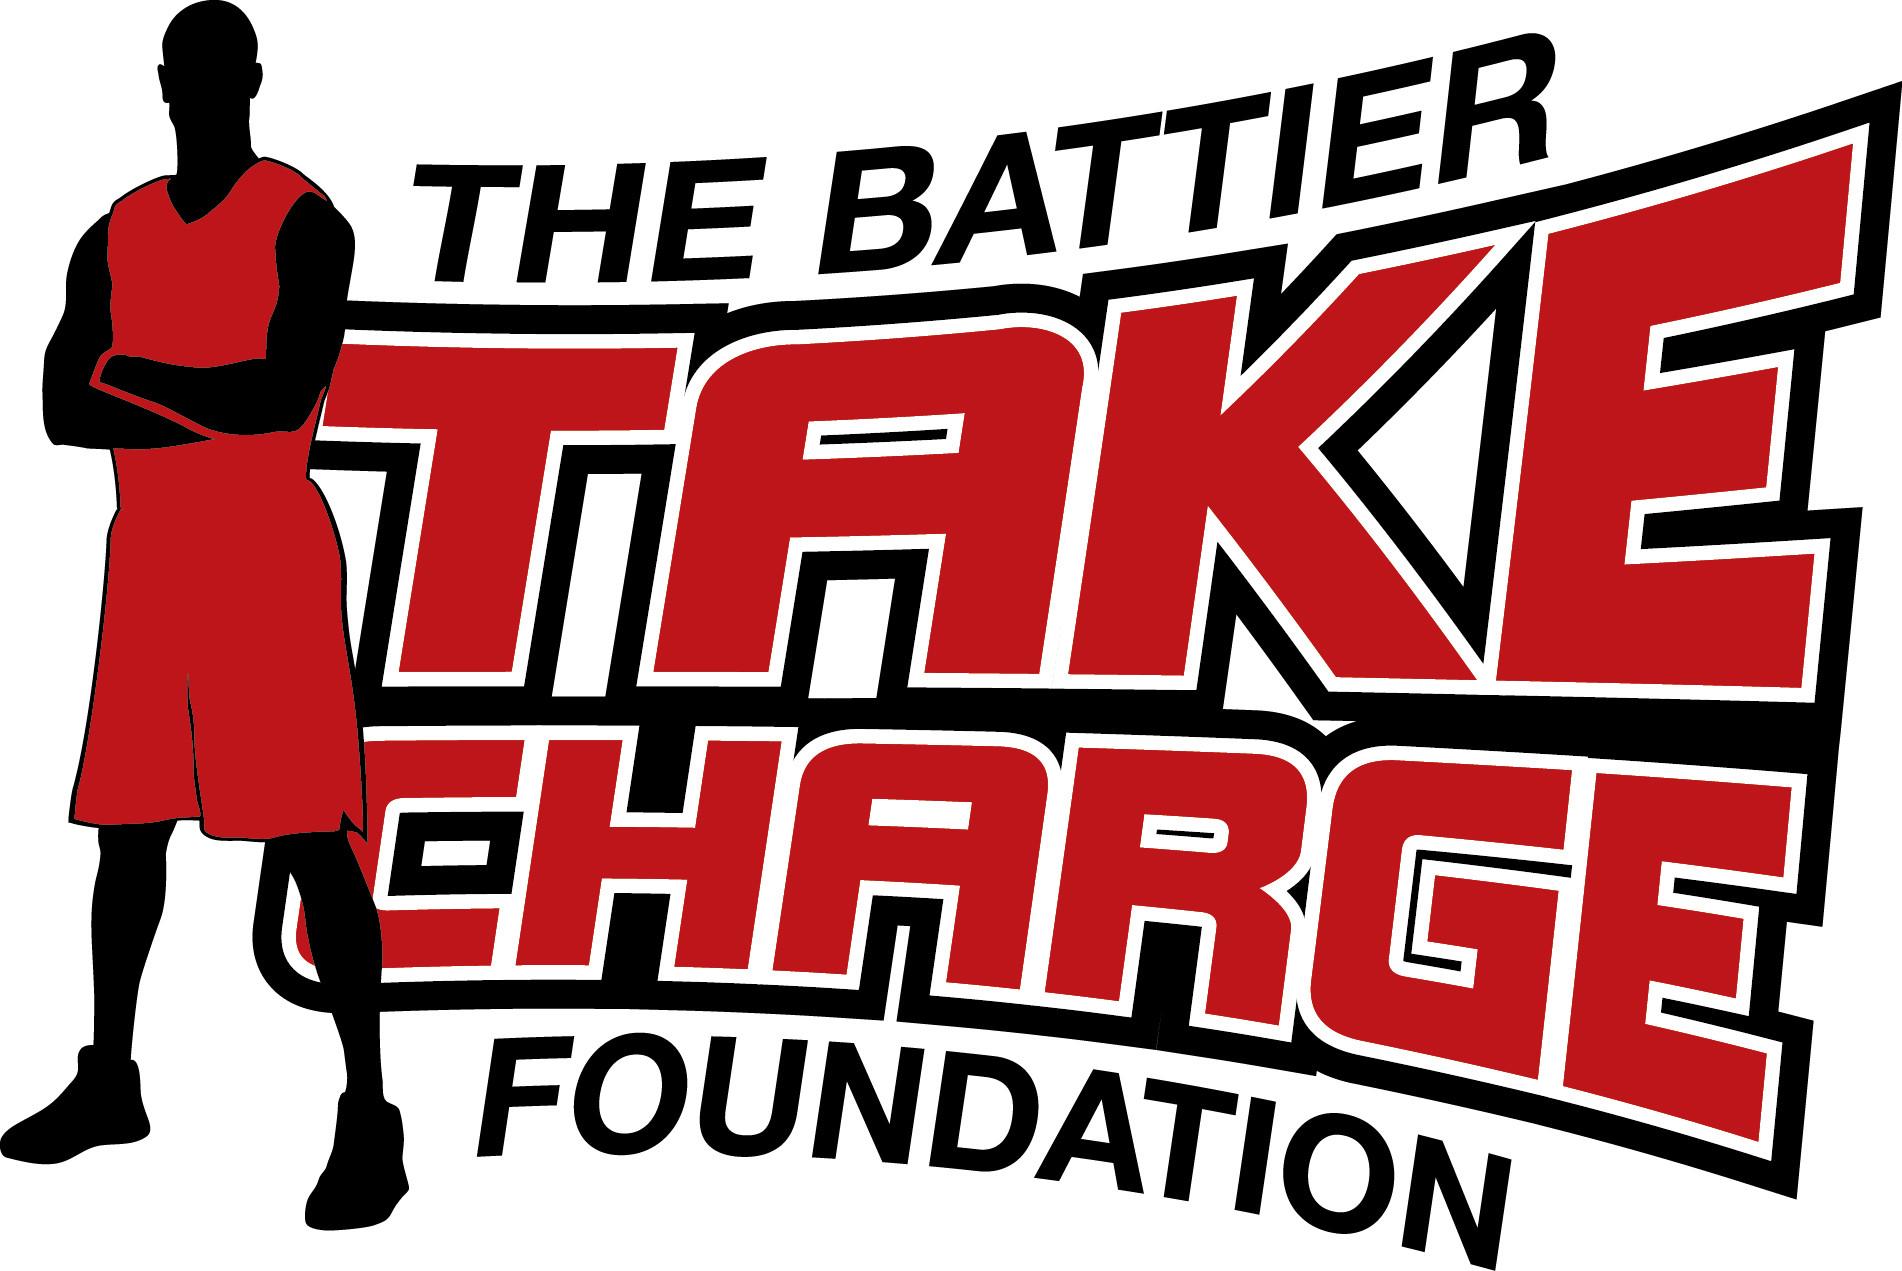 Battier logo Before